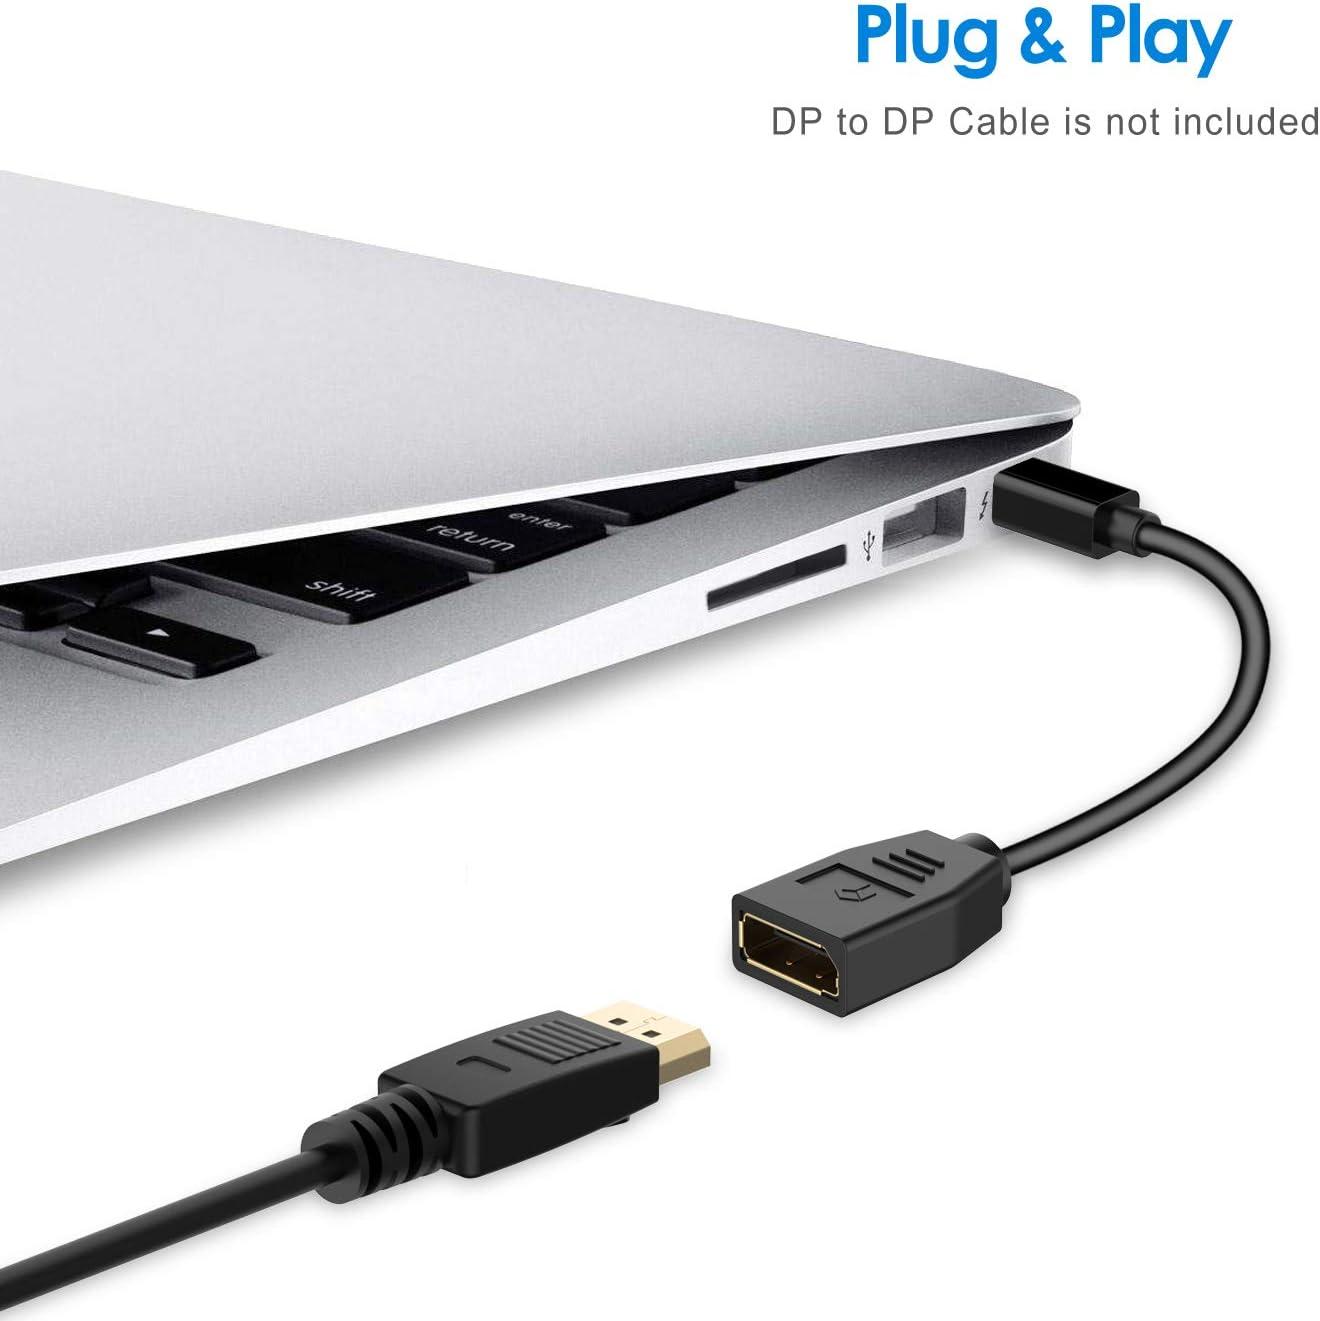 4K Resolution Converter Black Rankie Mini DisplayPort to DisplayPort Adapter